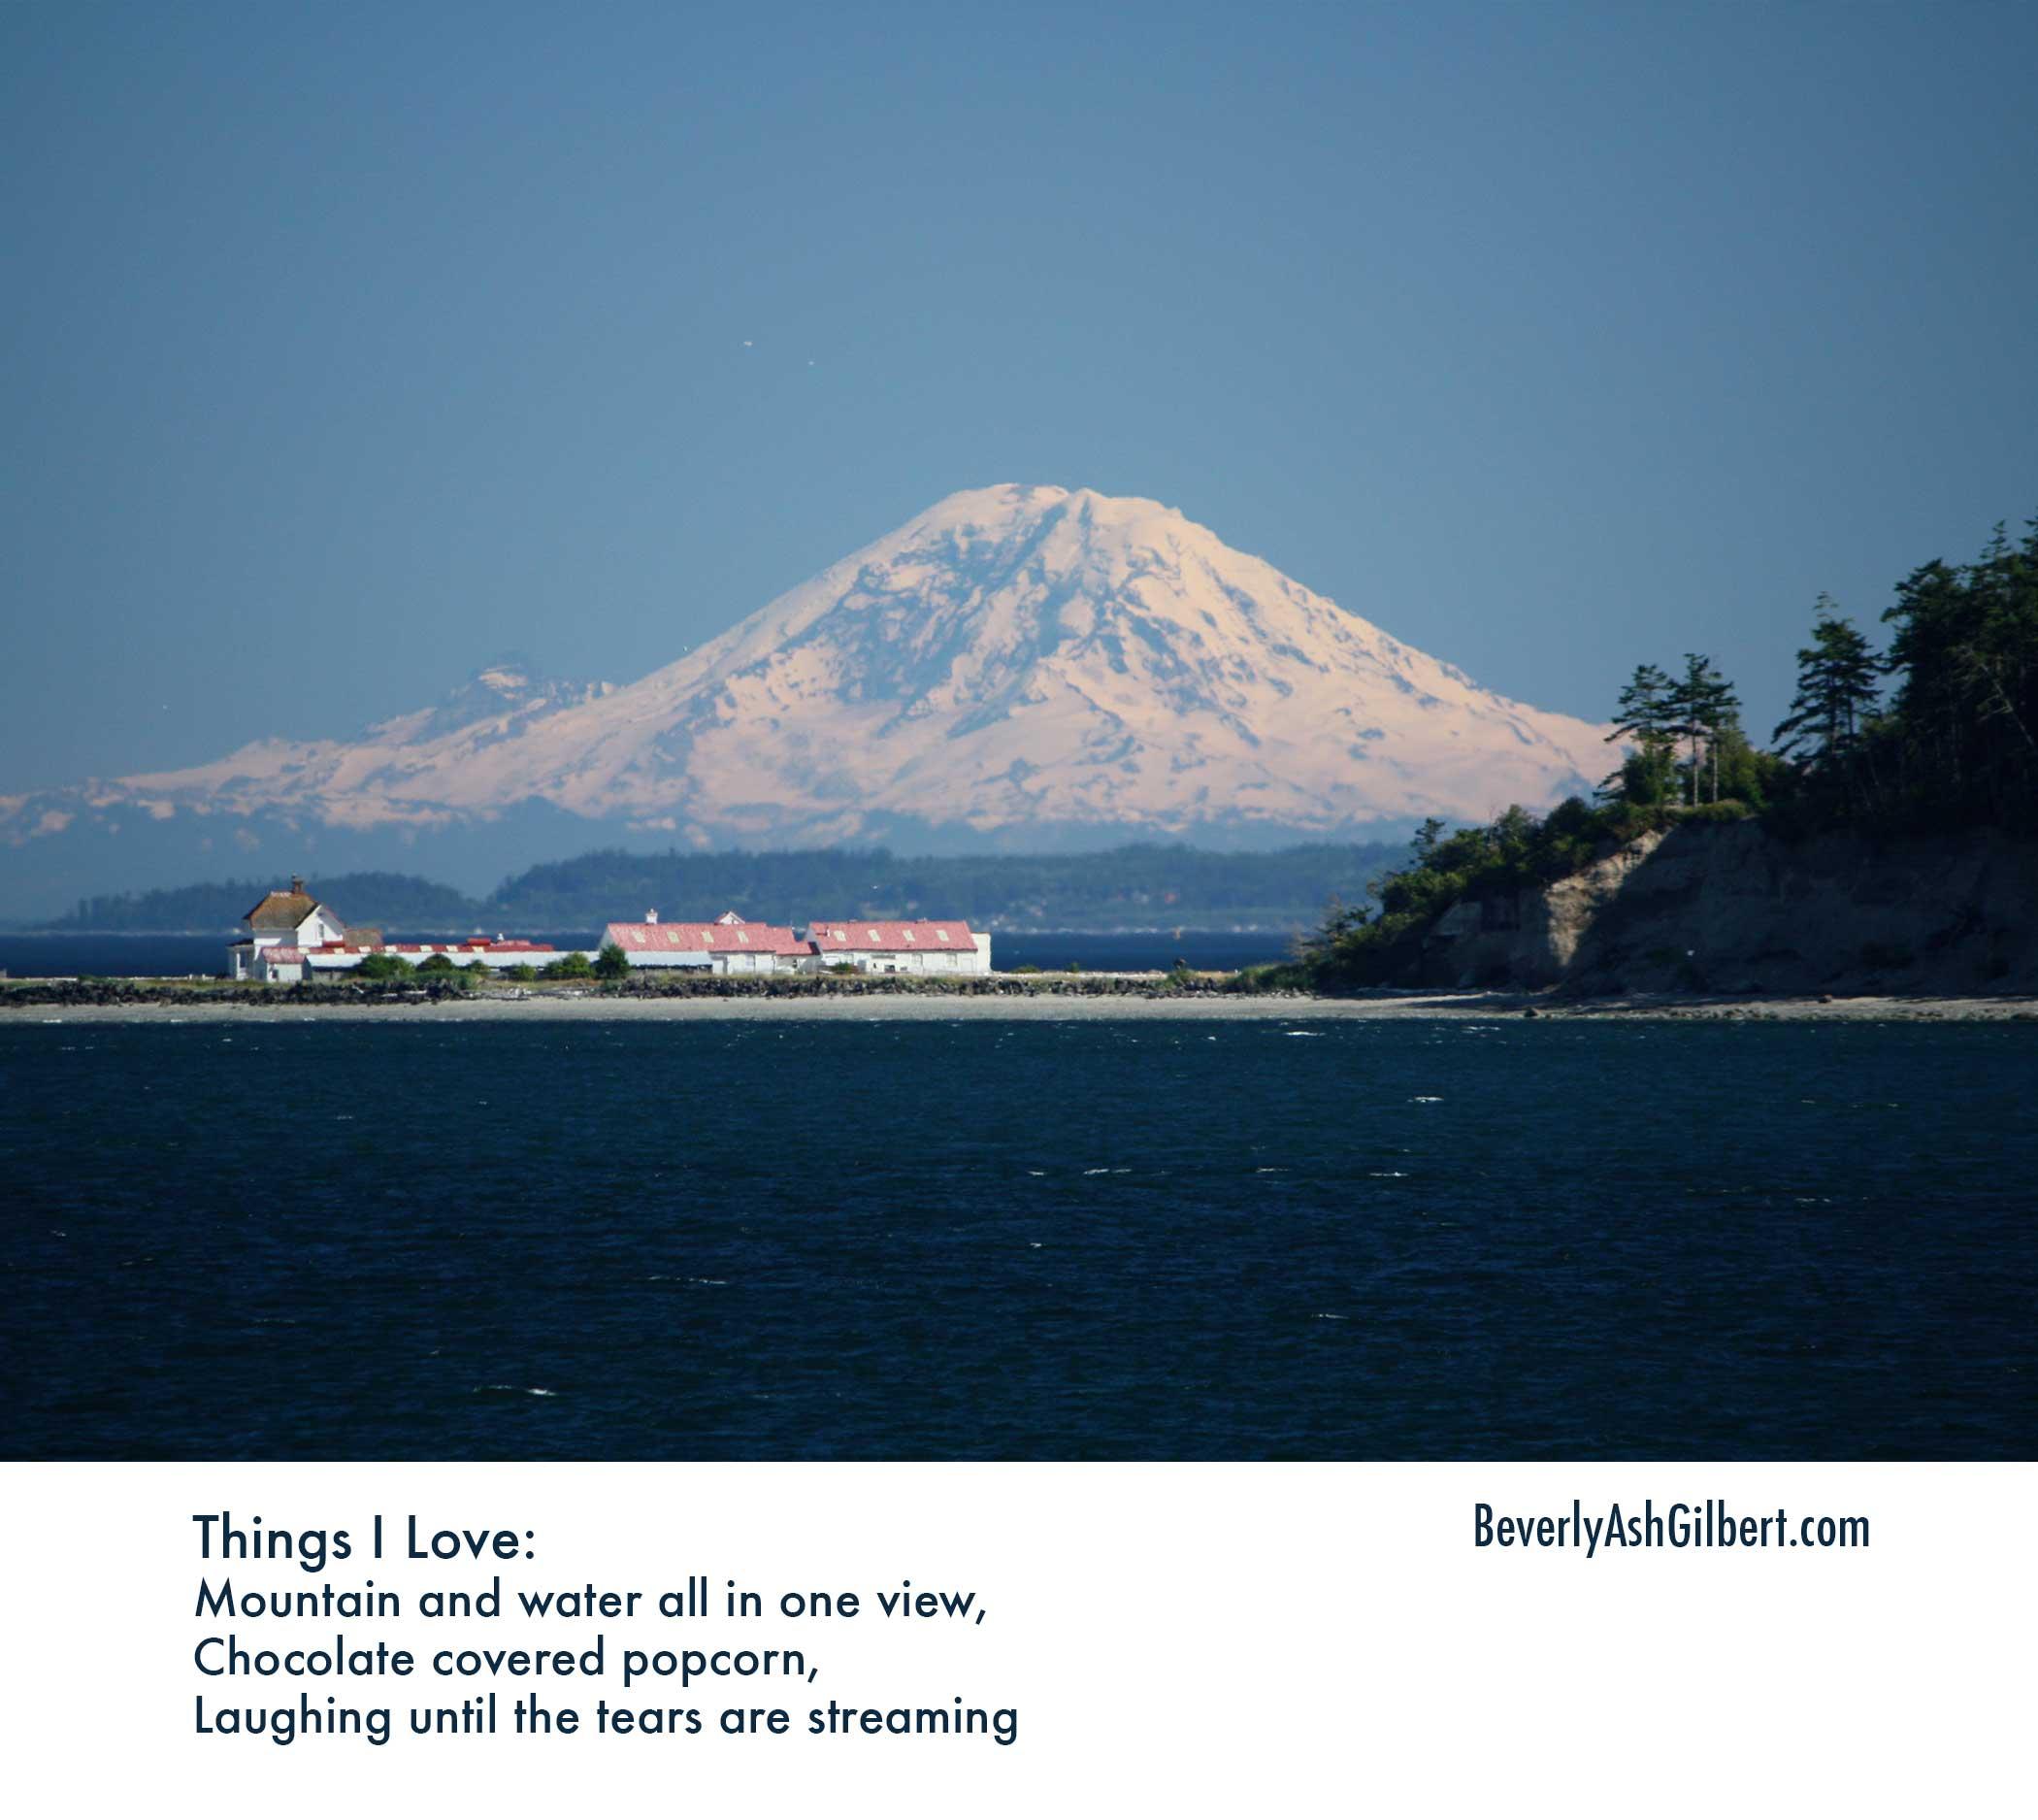 ThingsILove_MountainWater.jpg